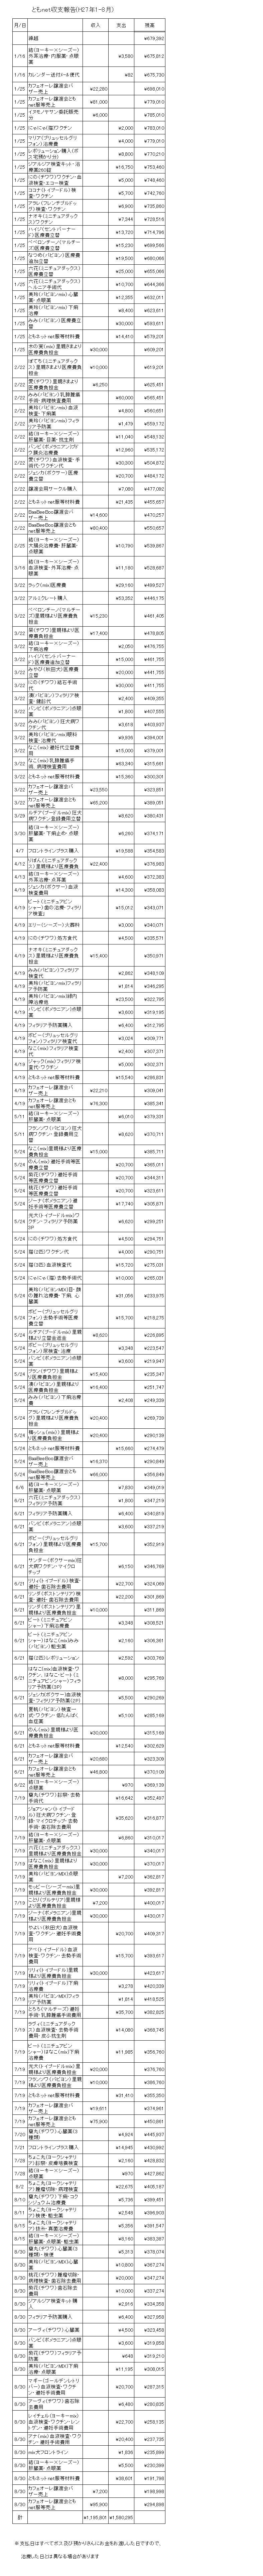 27-1-8収支報告